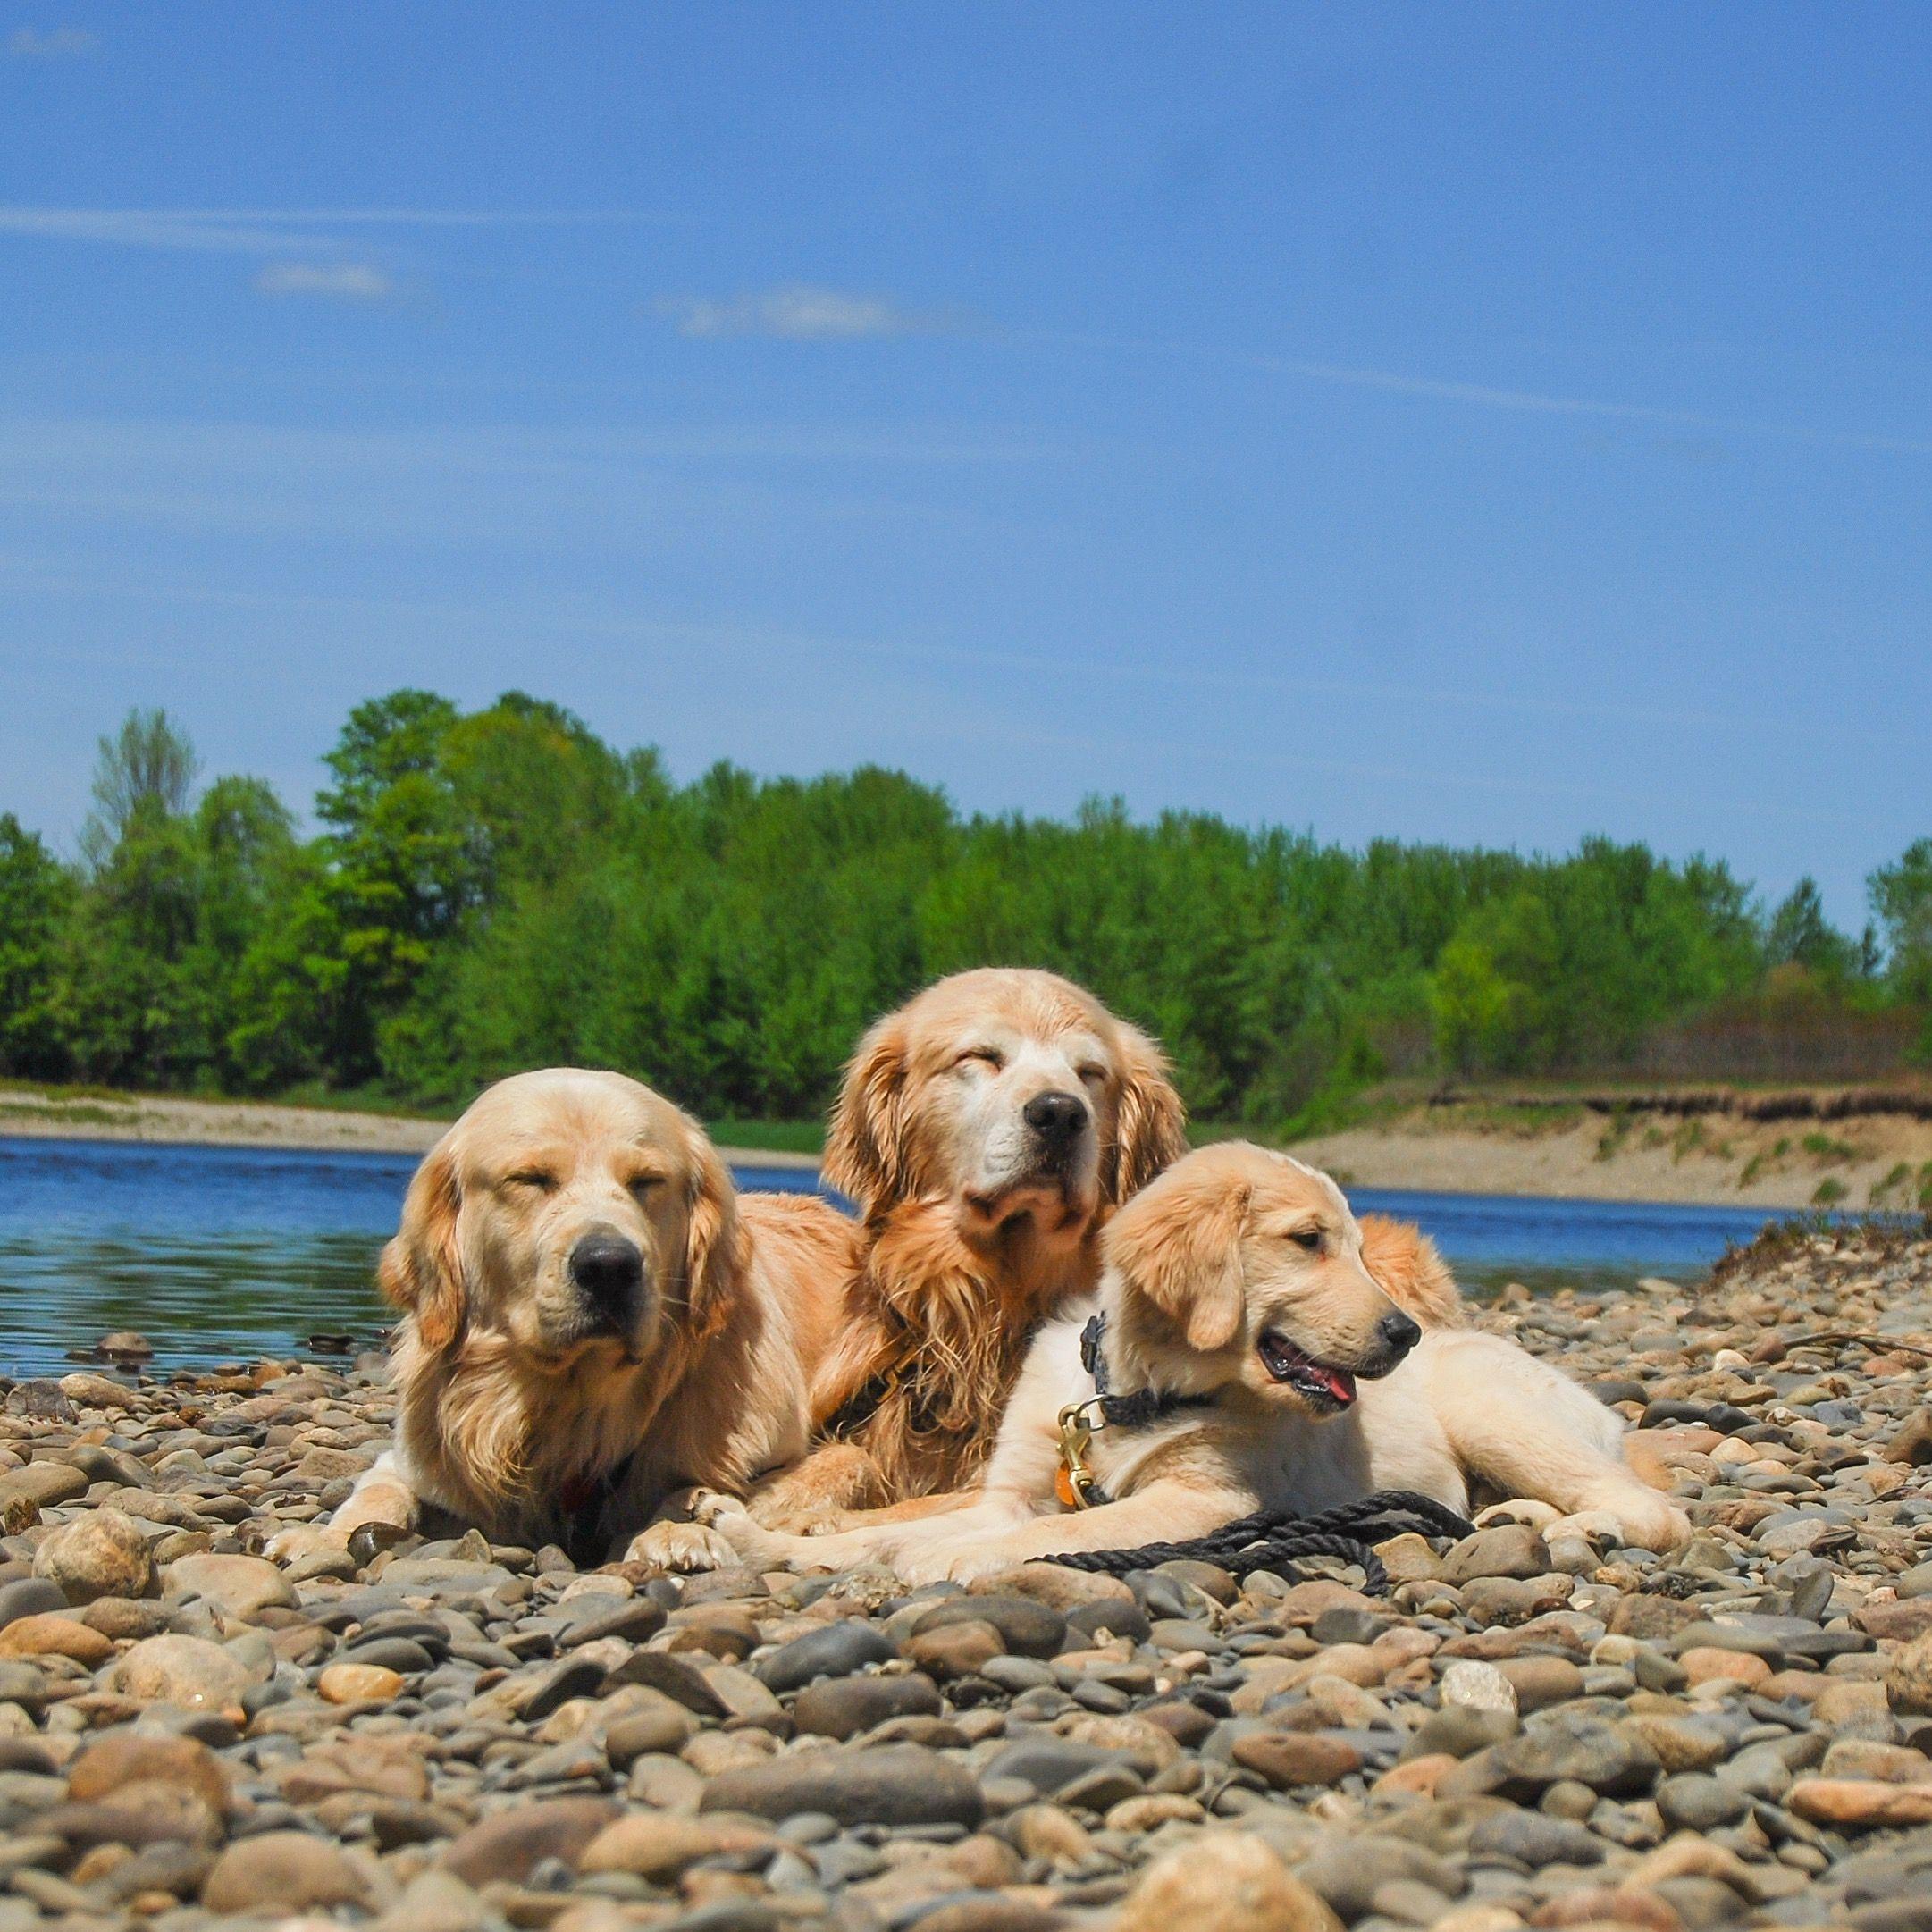 Pin By Liliana Nicoleta Chira On Dogs Caini Caini